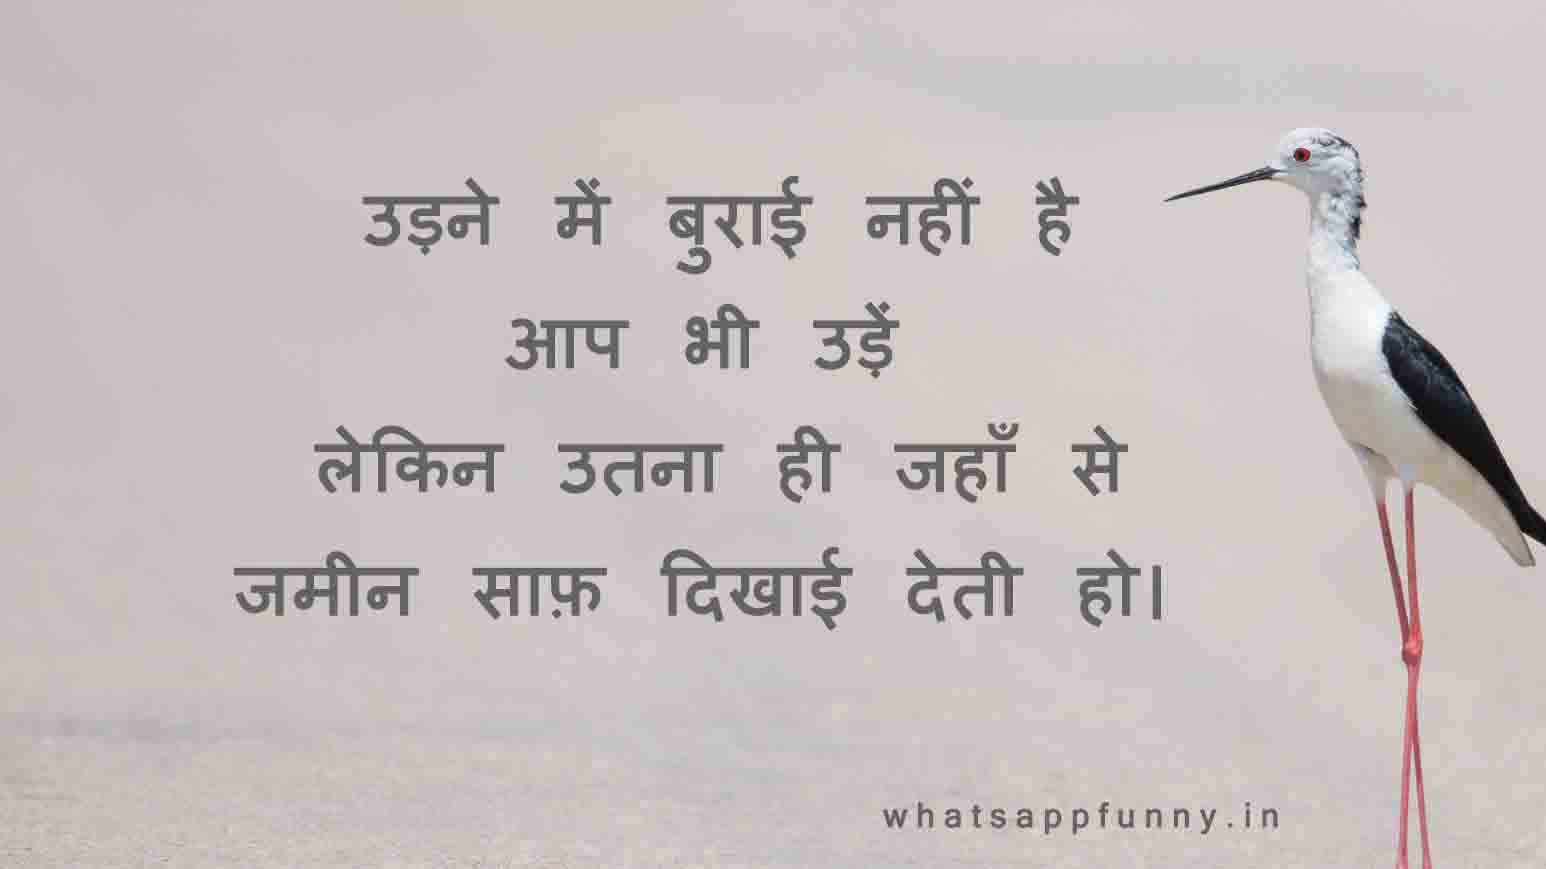 Whatsapp Profile Pic on Life in  hindi